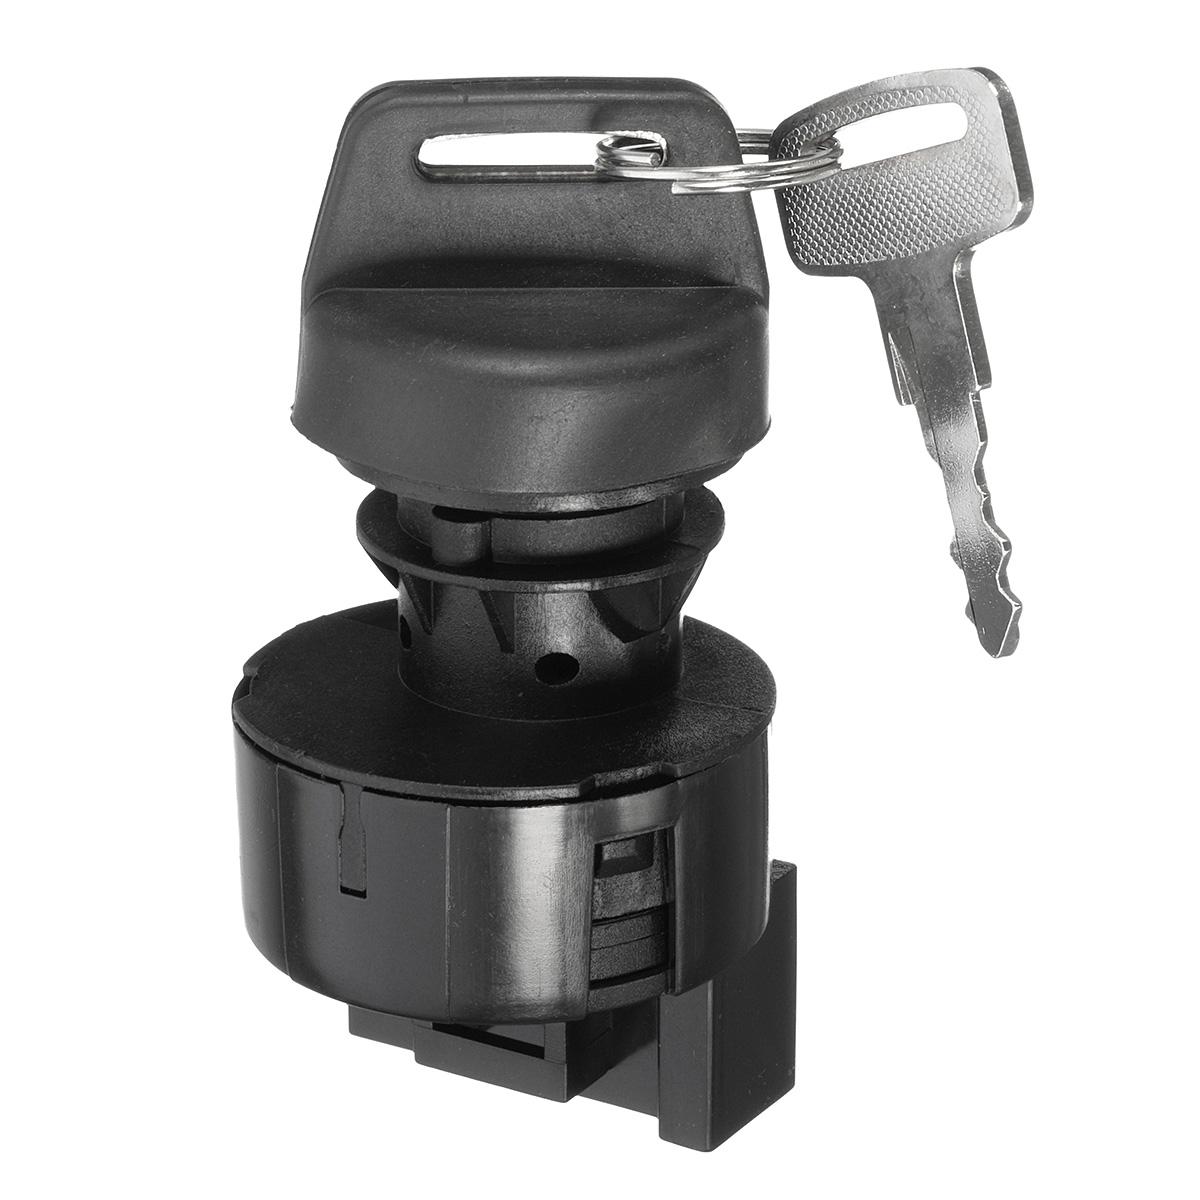 Ignition Switch & 2 Keys For 08-16 Arctic Cat 400 500 650 700 1000 TRV 550 XR XT